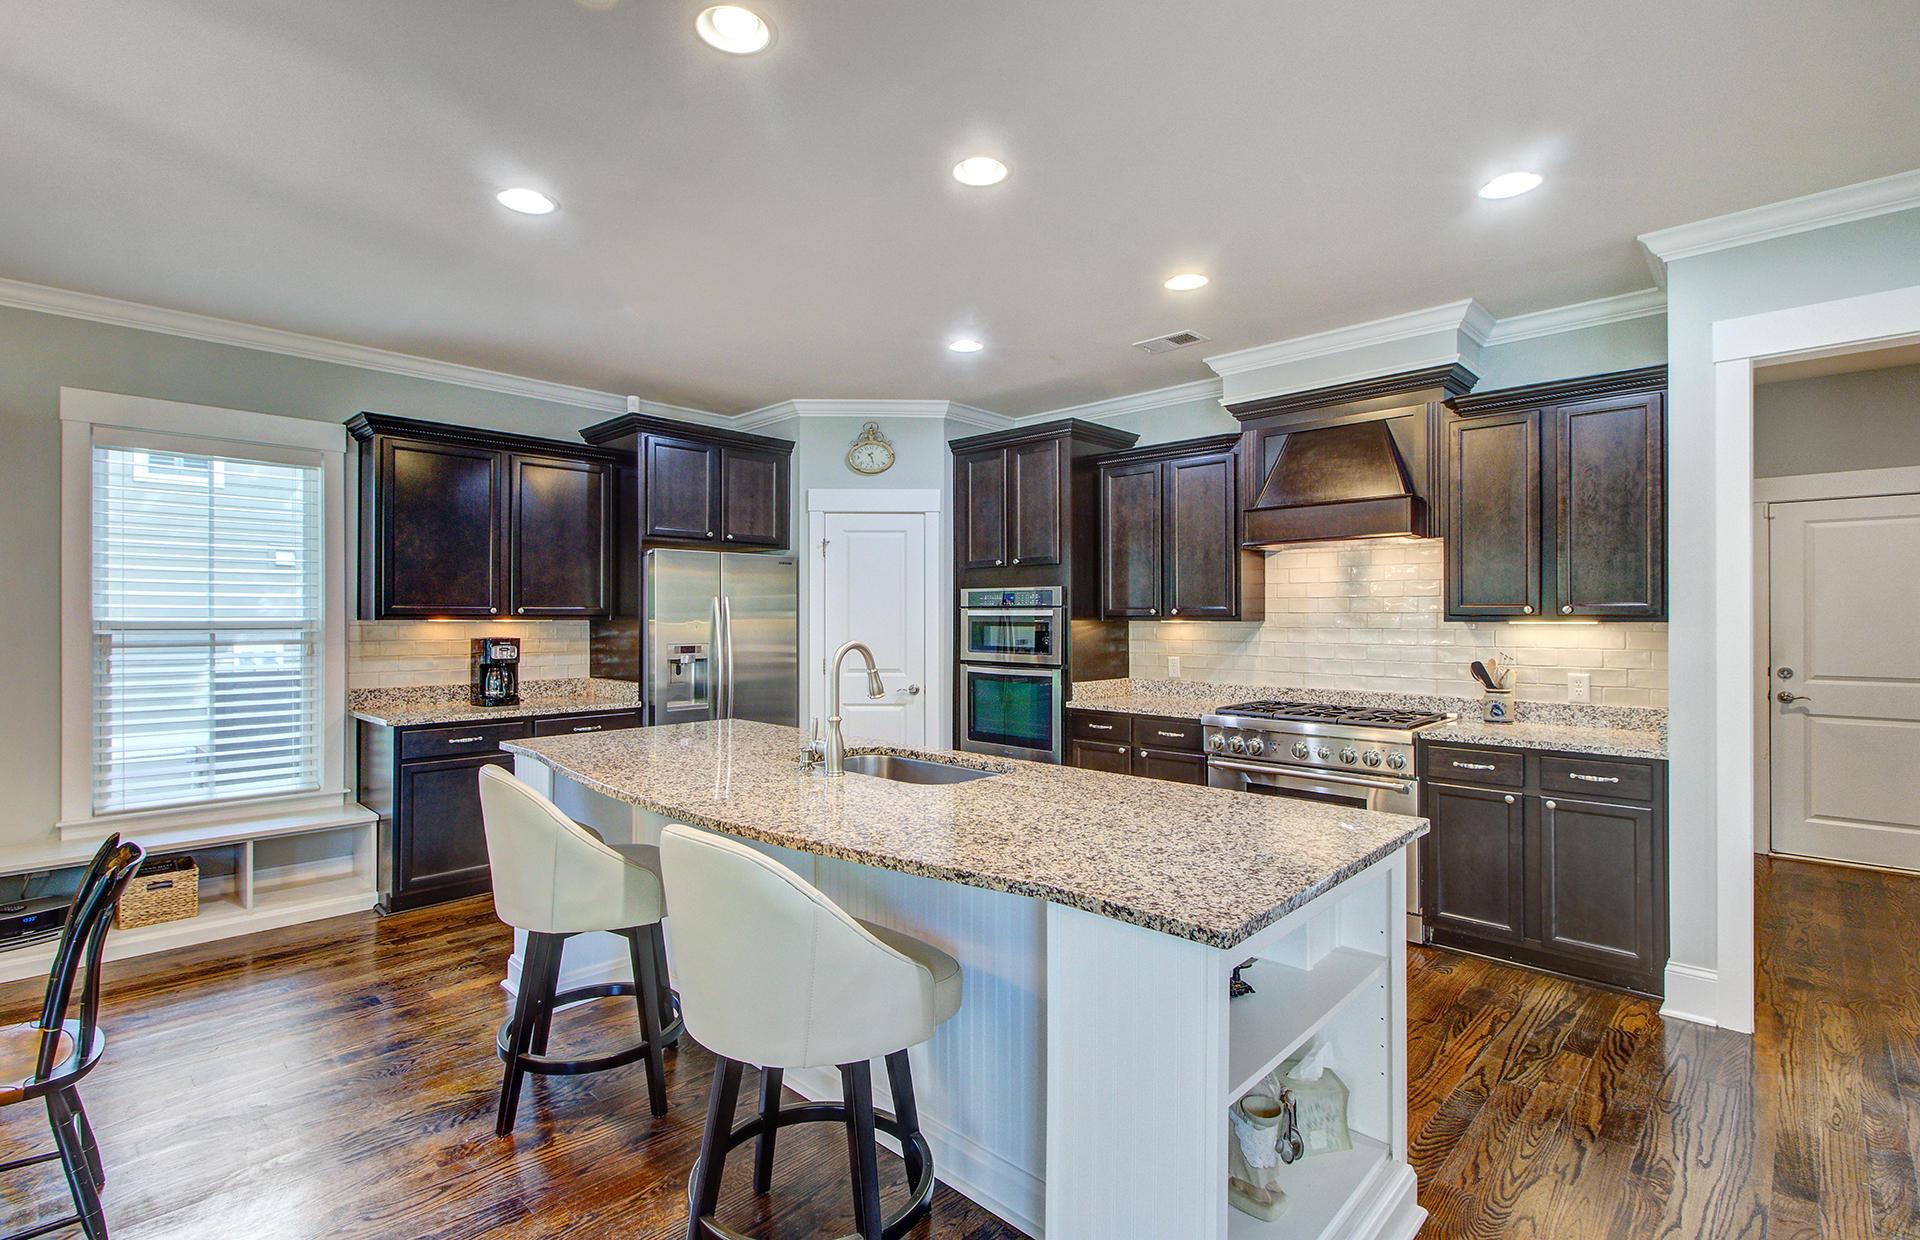 Scotts Creek Homes For Sale - 1404 Scotts Creek, Mount Pleasant, SC - 28